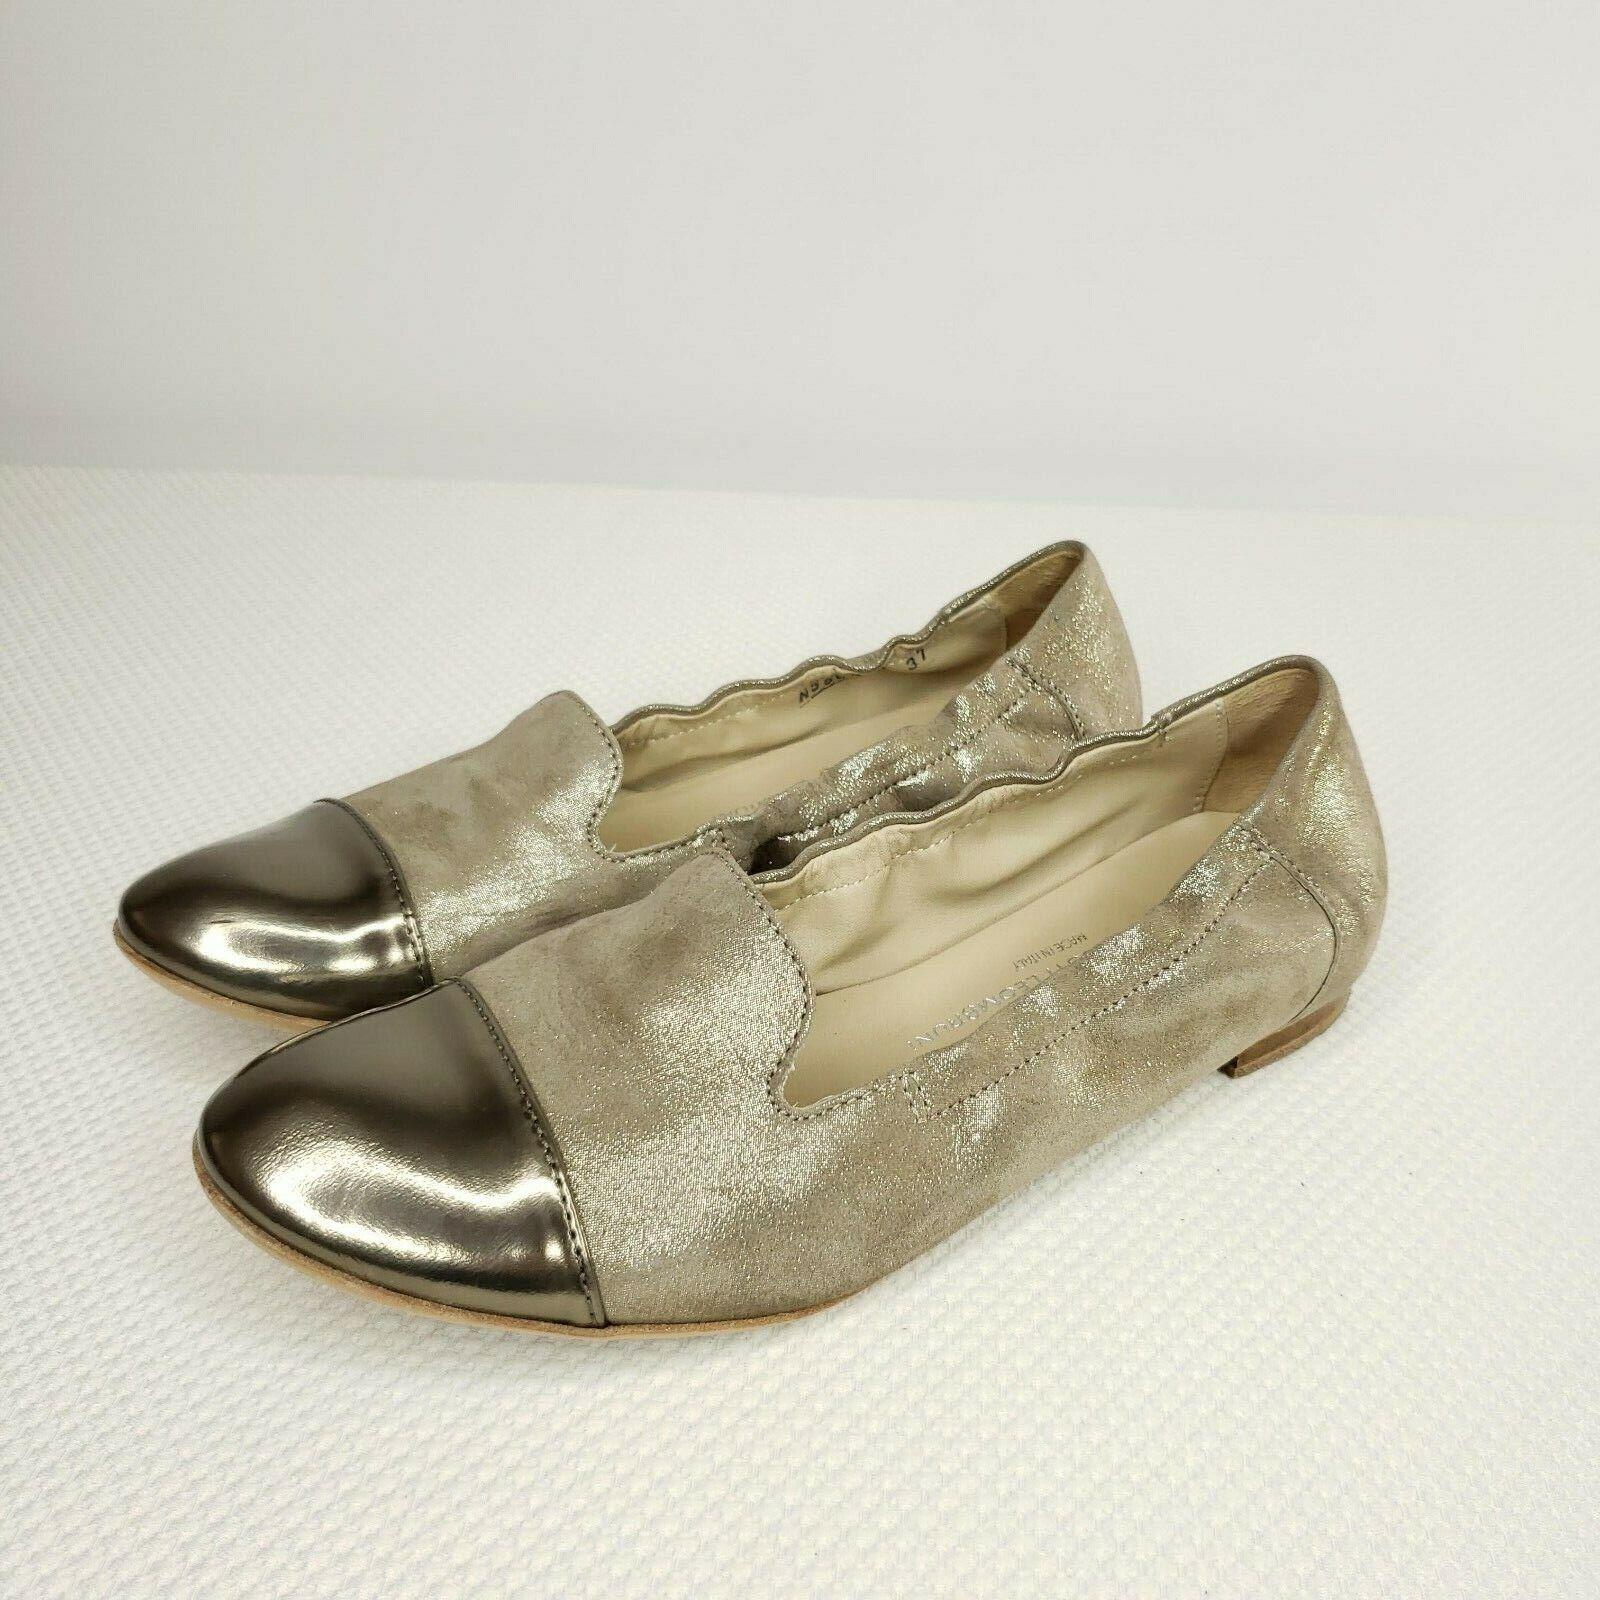 AGL ATTILIO GIUSTI LEOMBRUNI Size 7 US Ginger gold Ballet Flats shoes 37 EU